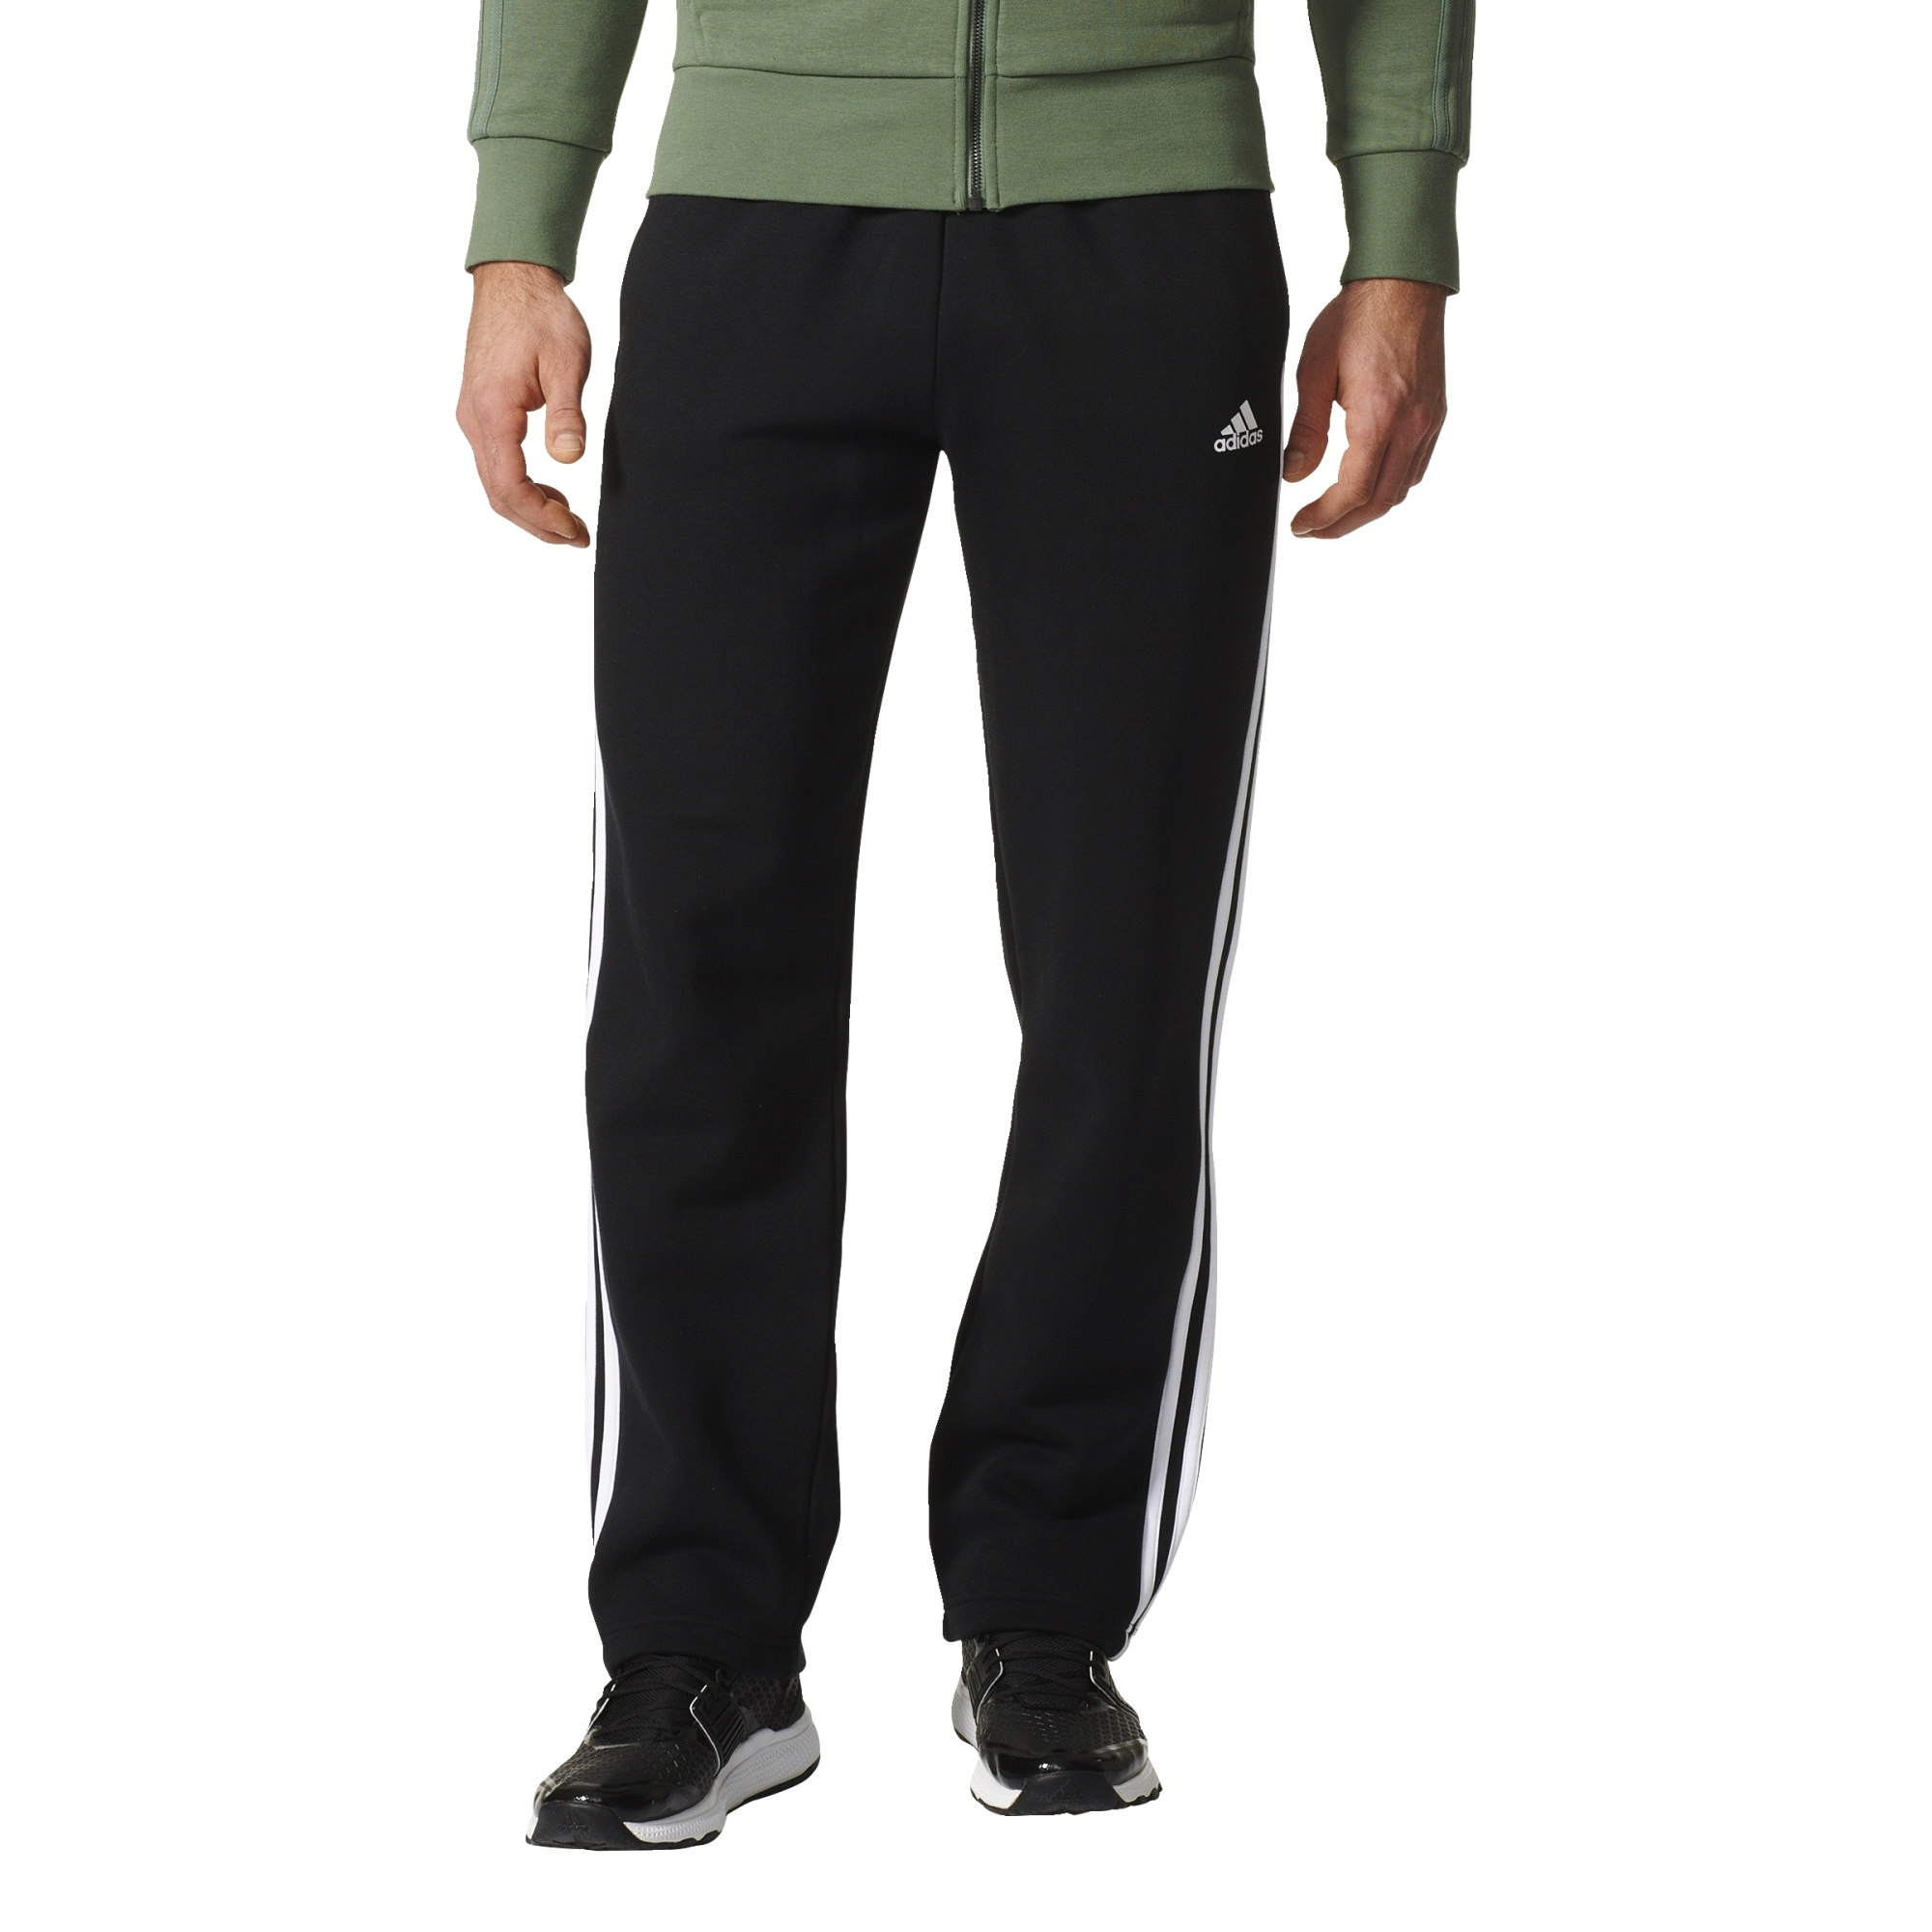 pantalon adidas 3 stripes